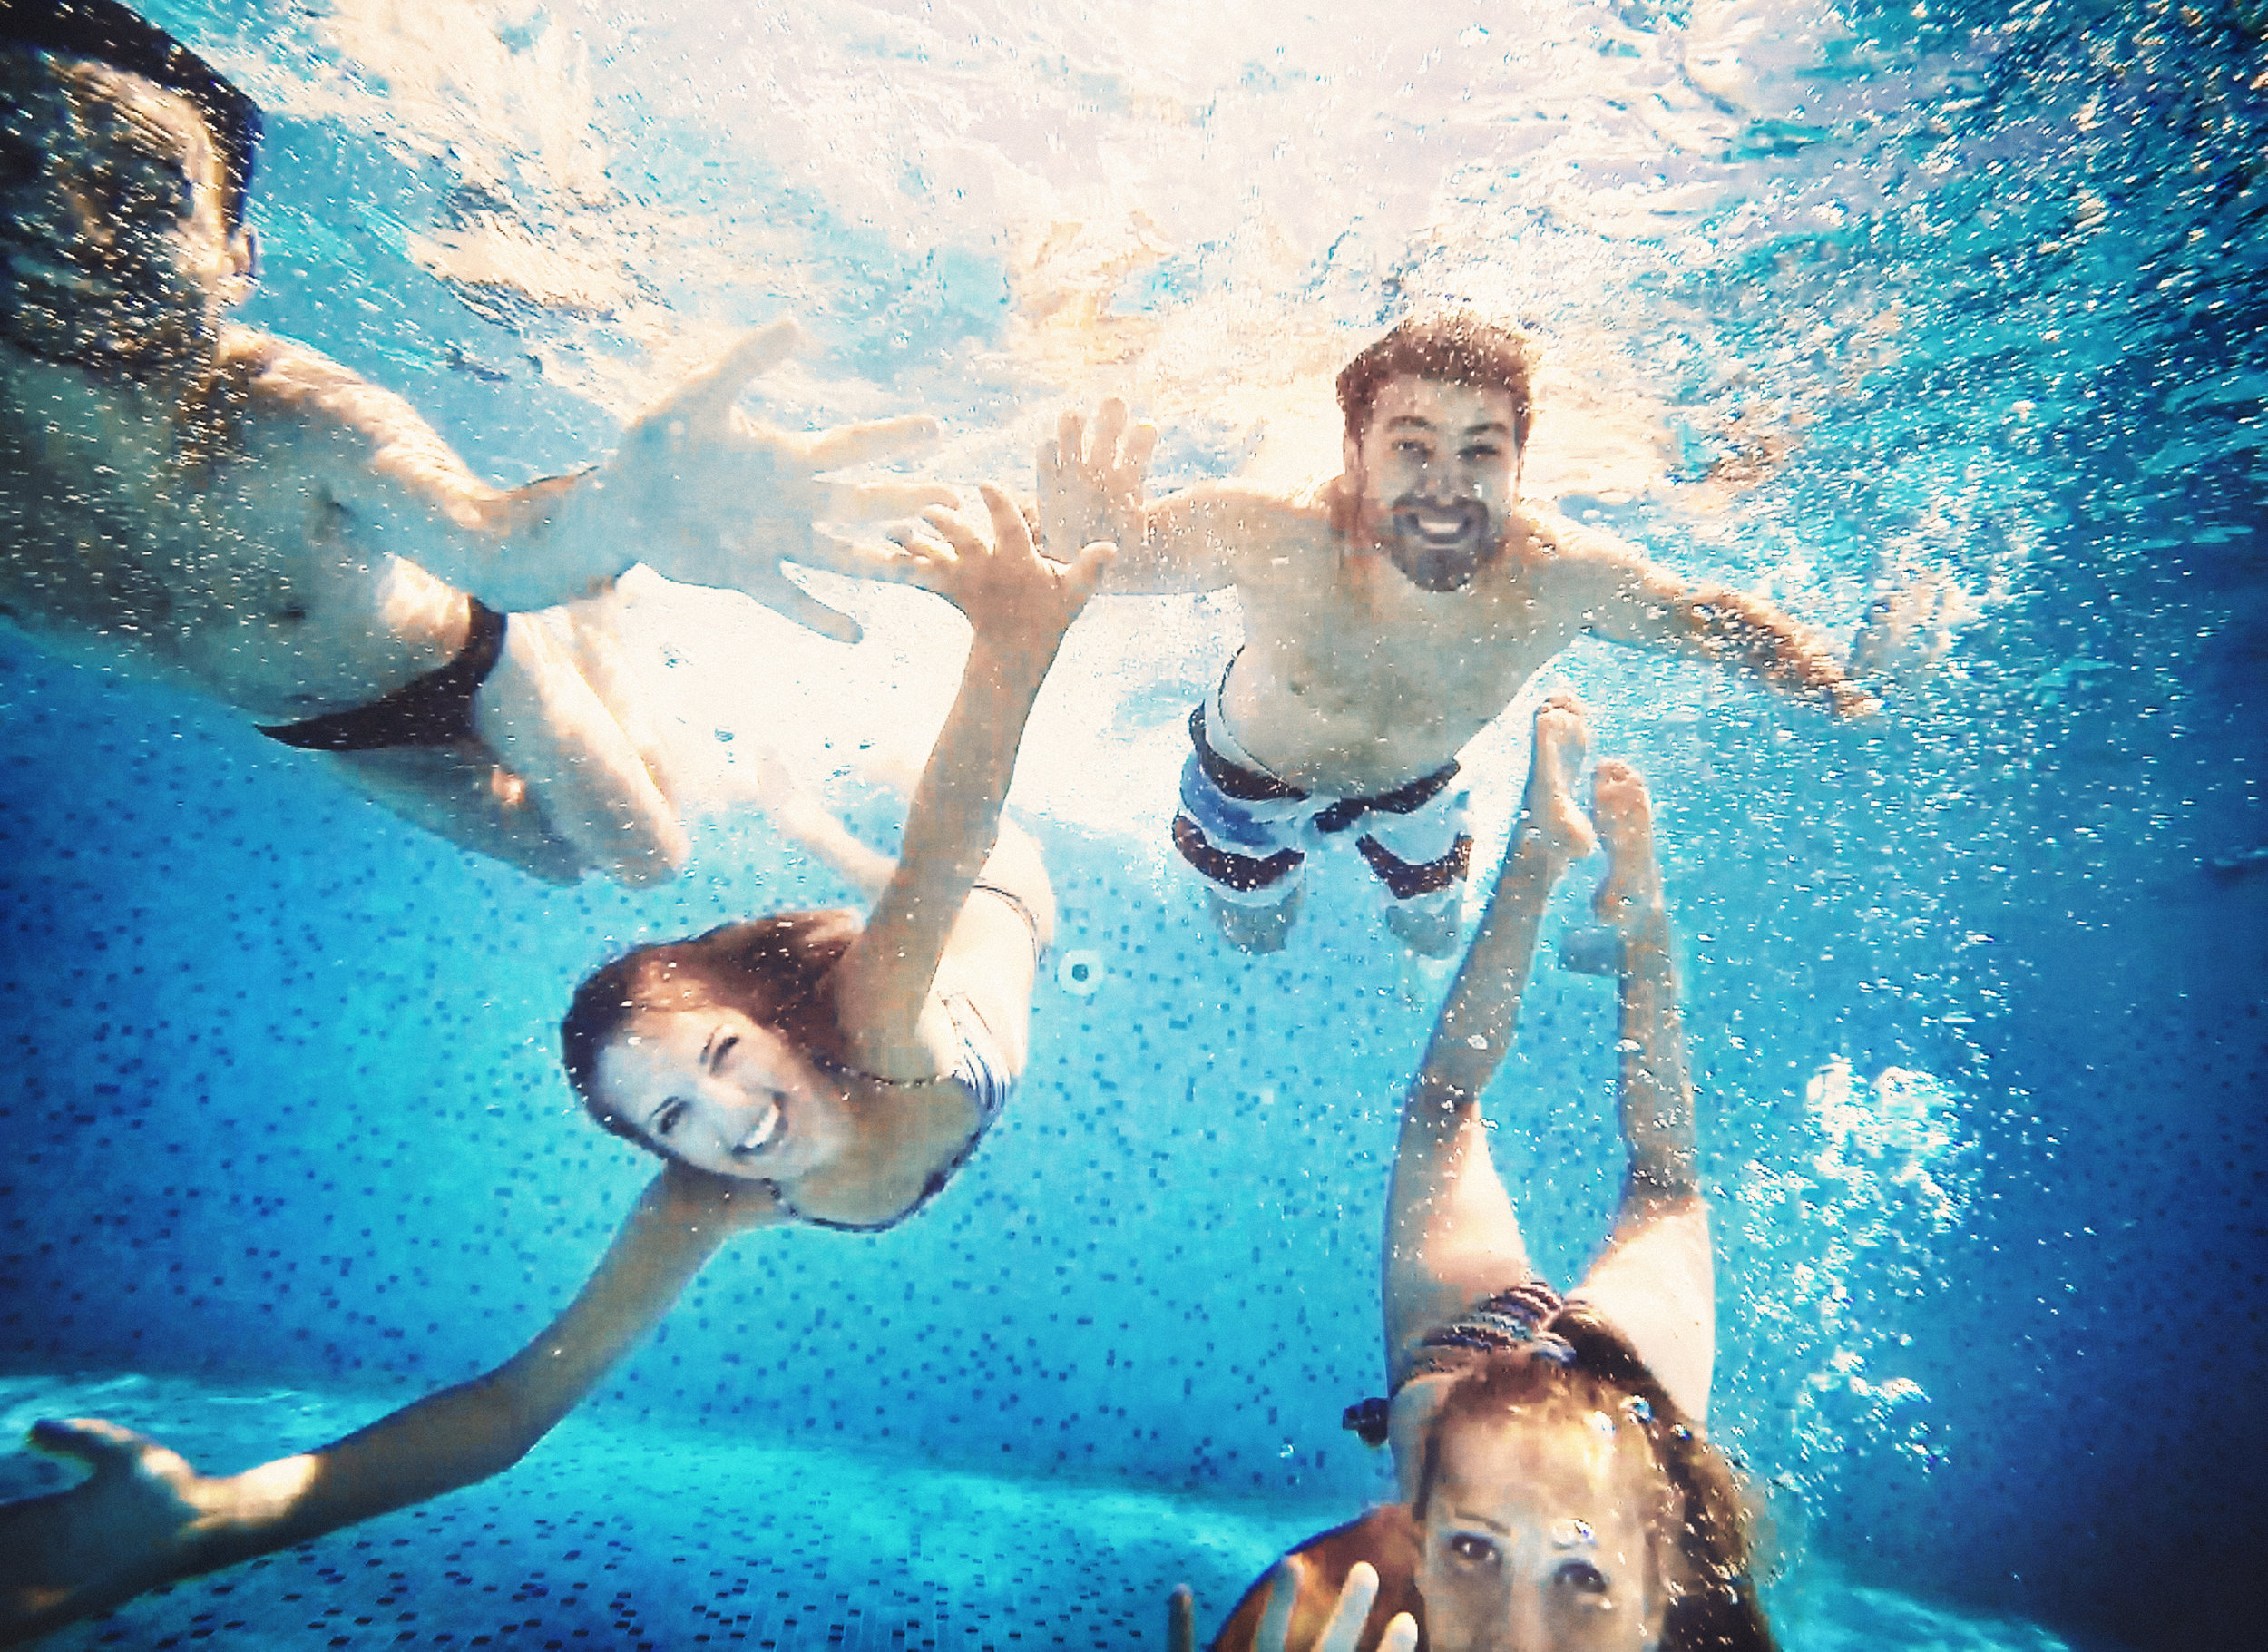 Friends in pool.jpg